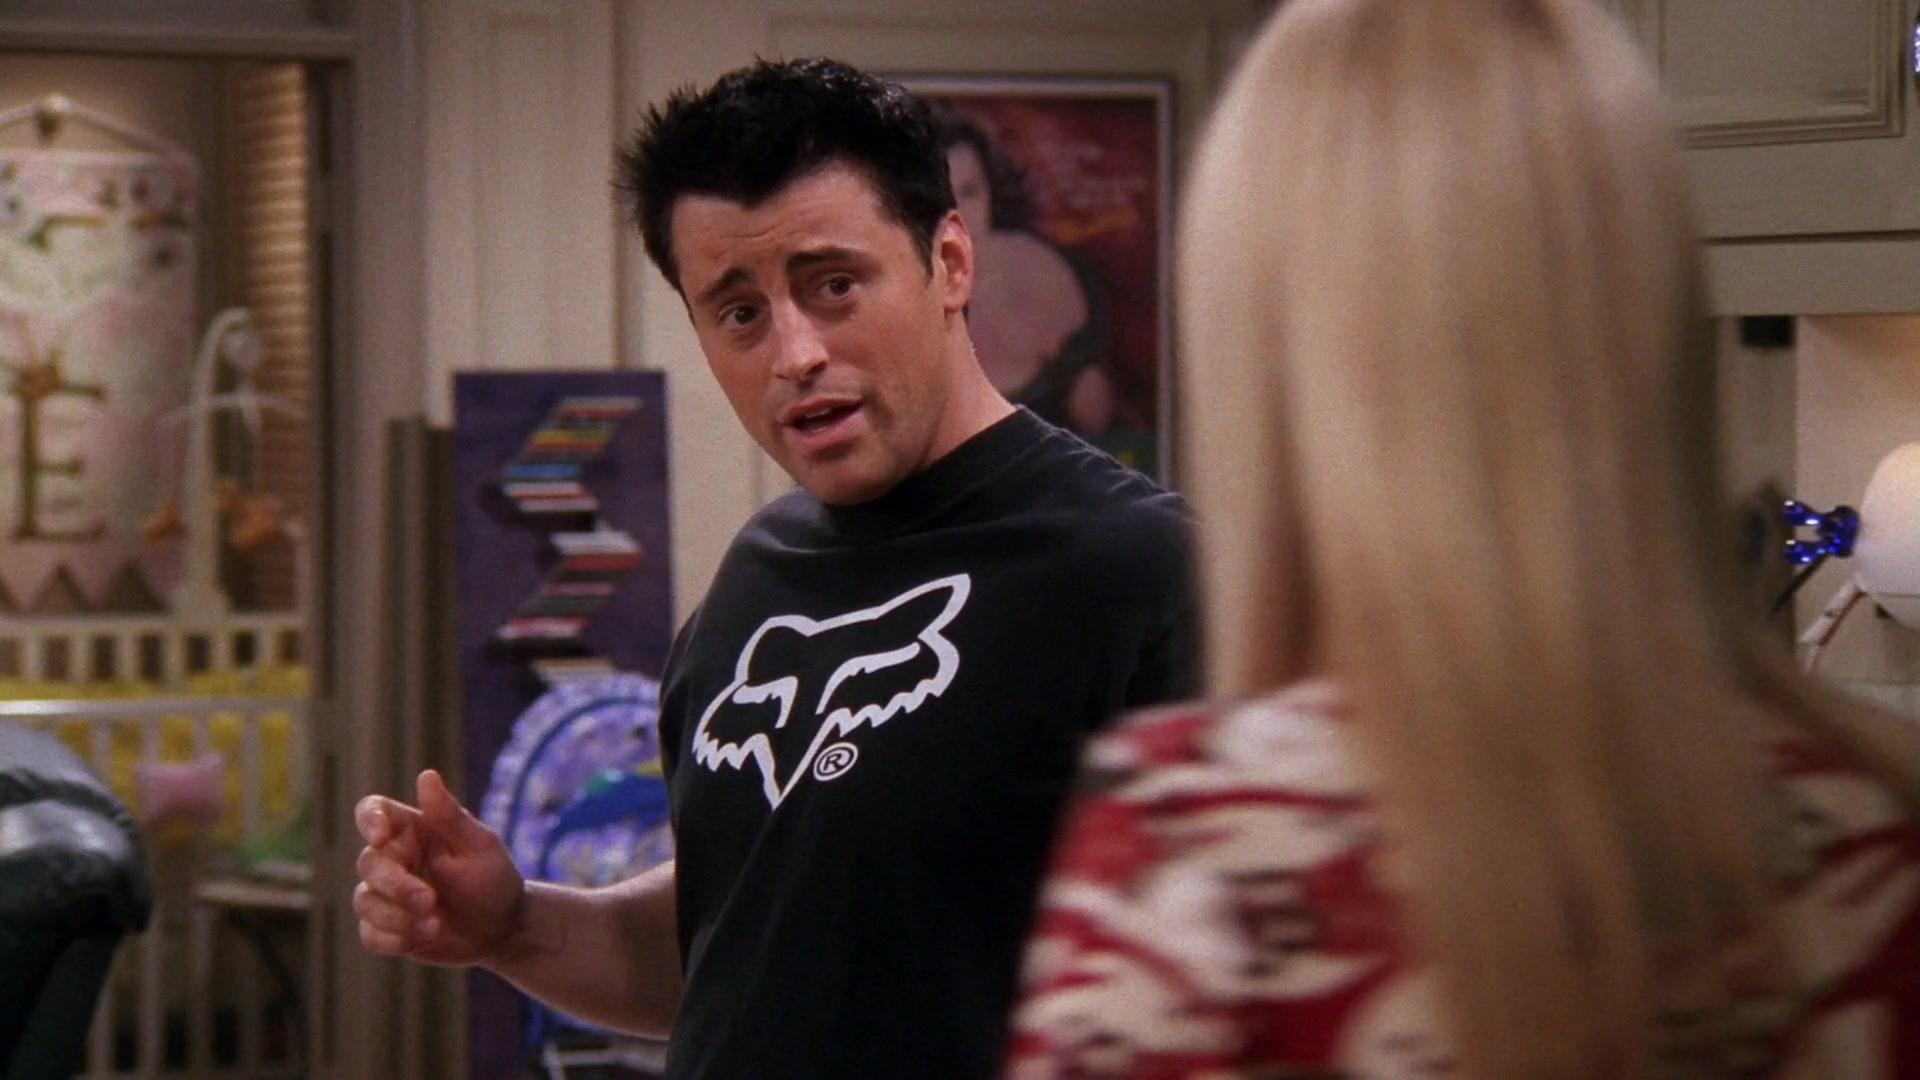 Fox Racing Black T-Shirt Worn by Matt LeBlanc (Joey Tribbiani) in